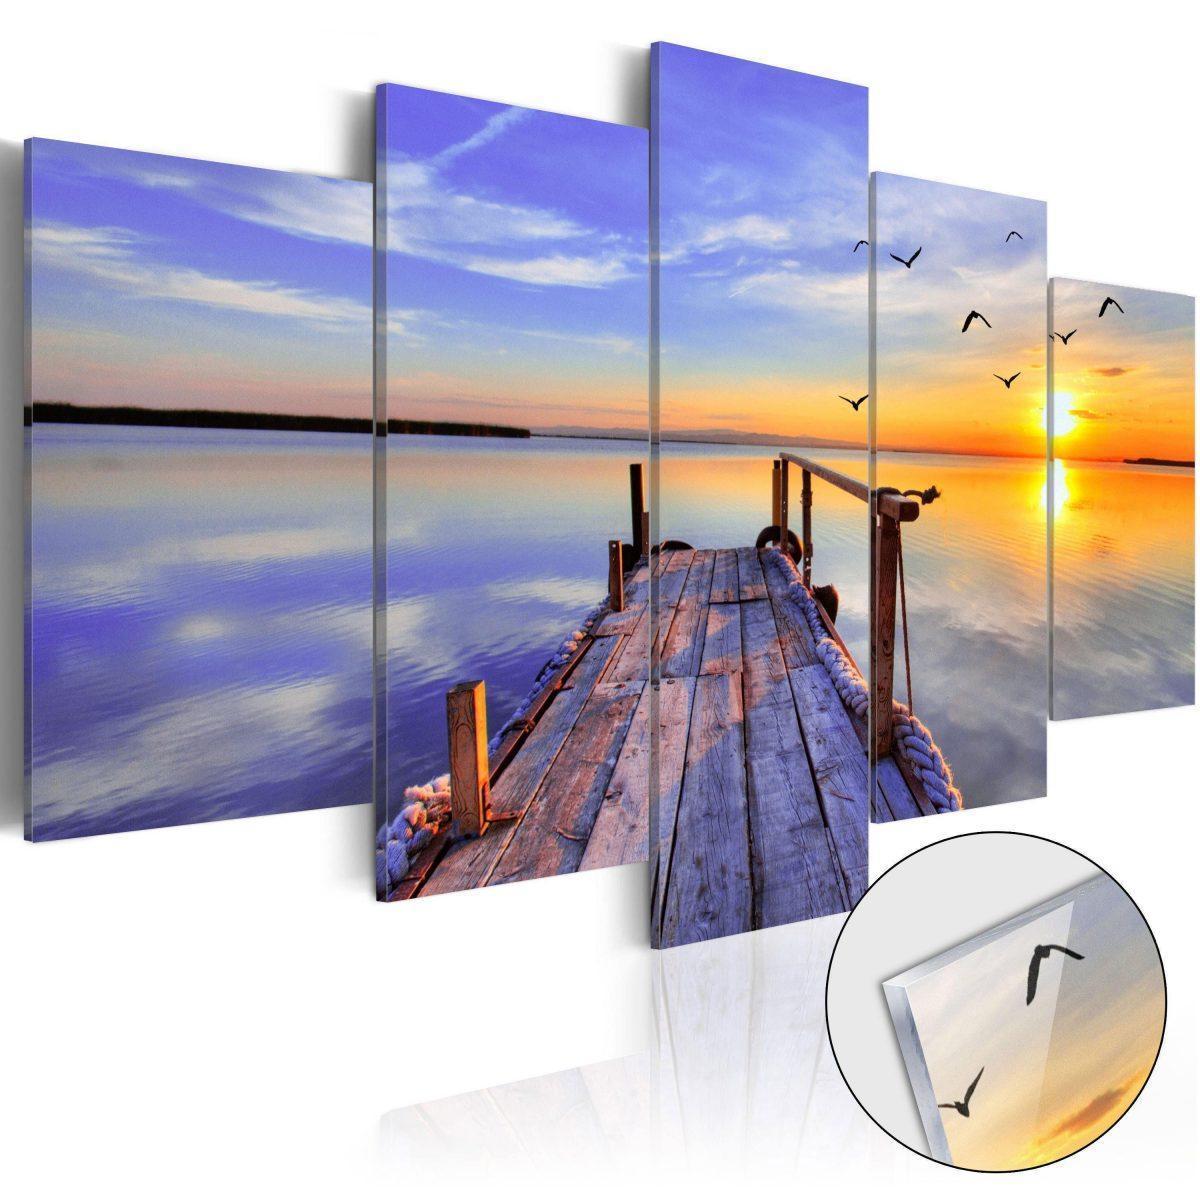 Tavla i akrylglas - Summer Harbor - 100x50